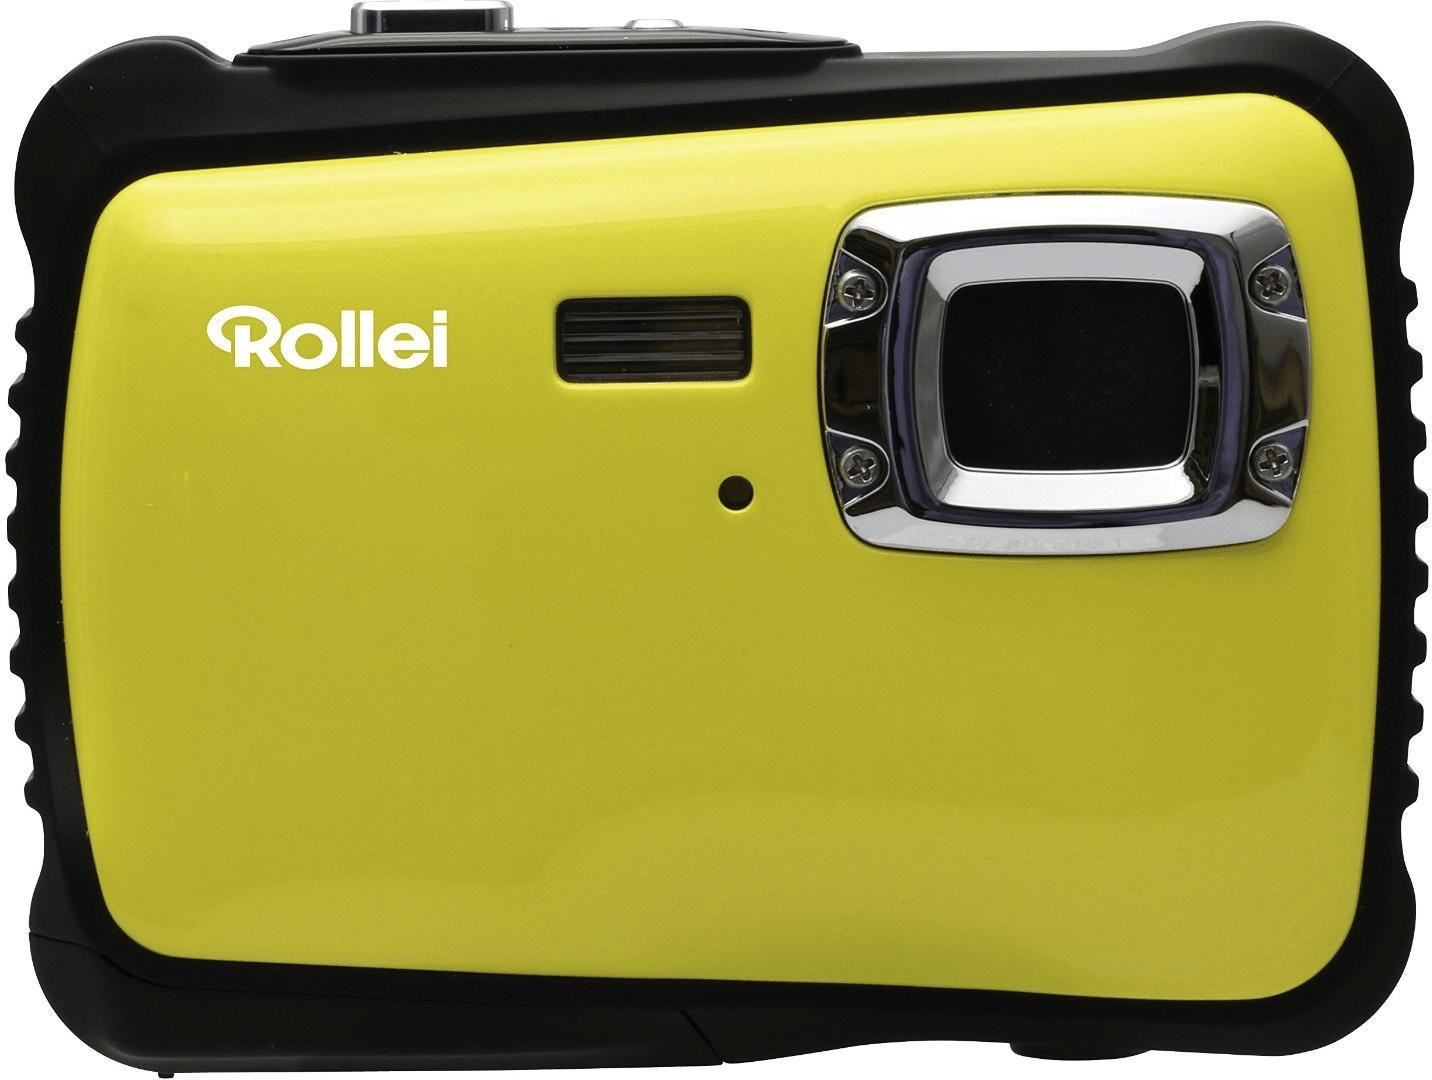 Rollei Sportsline 65 - Cámara digital compacta, Sensor CMOS de 5 me(Amarillo)